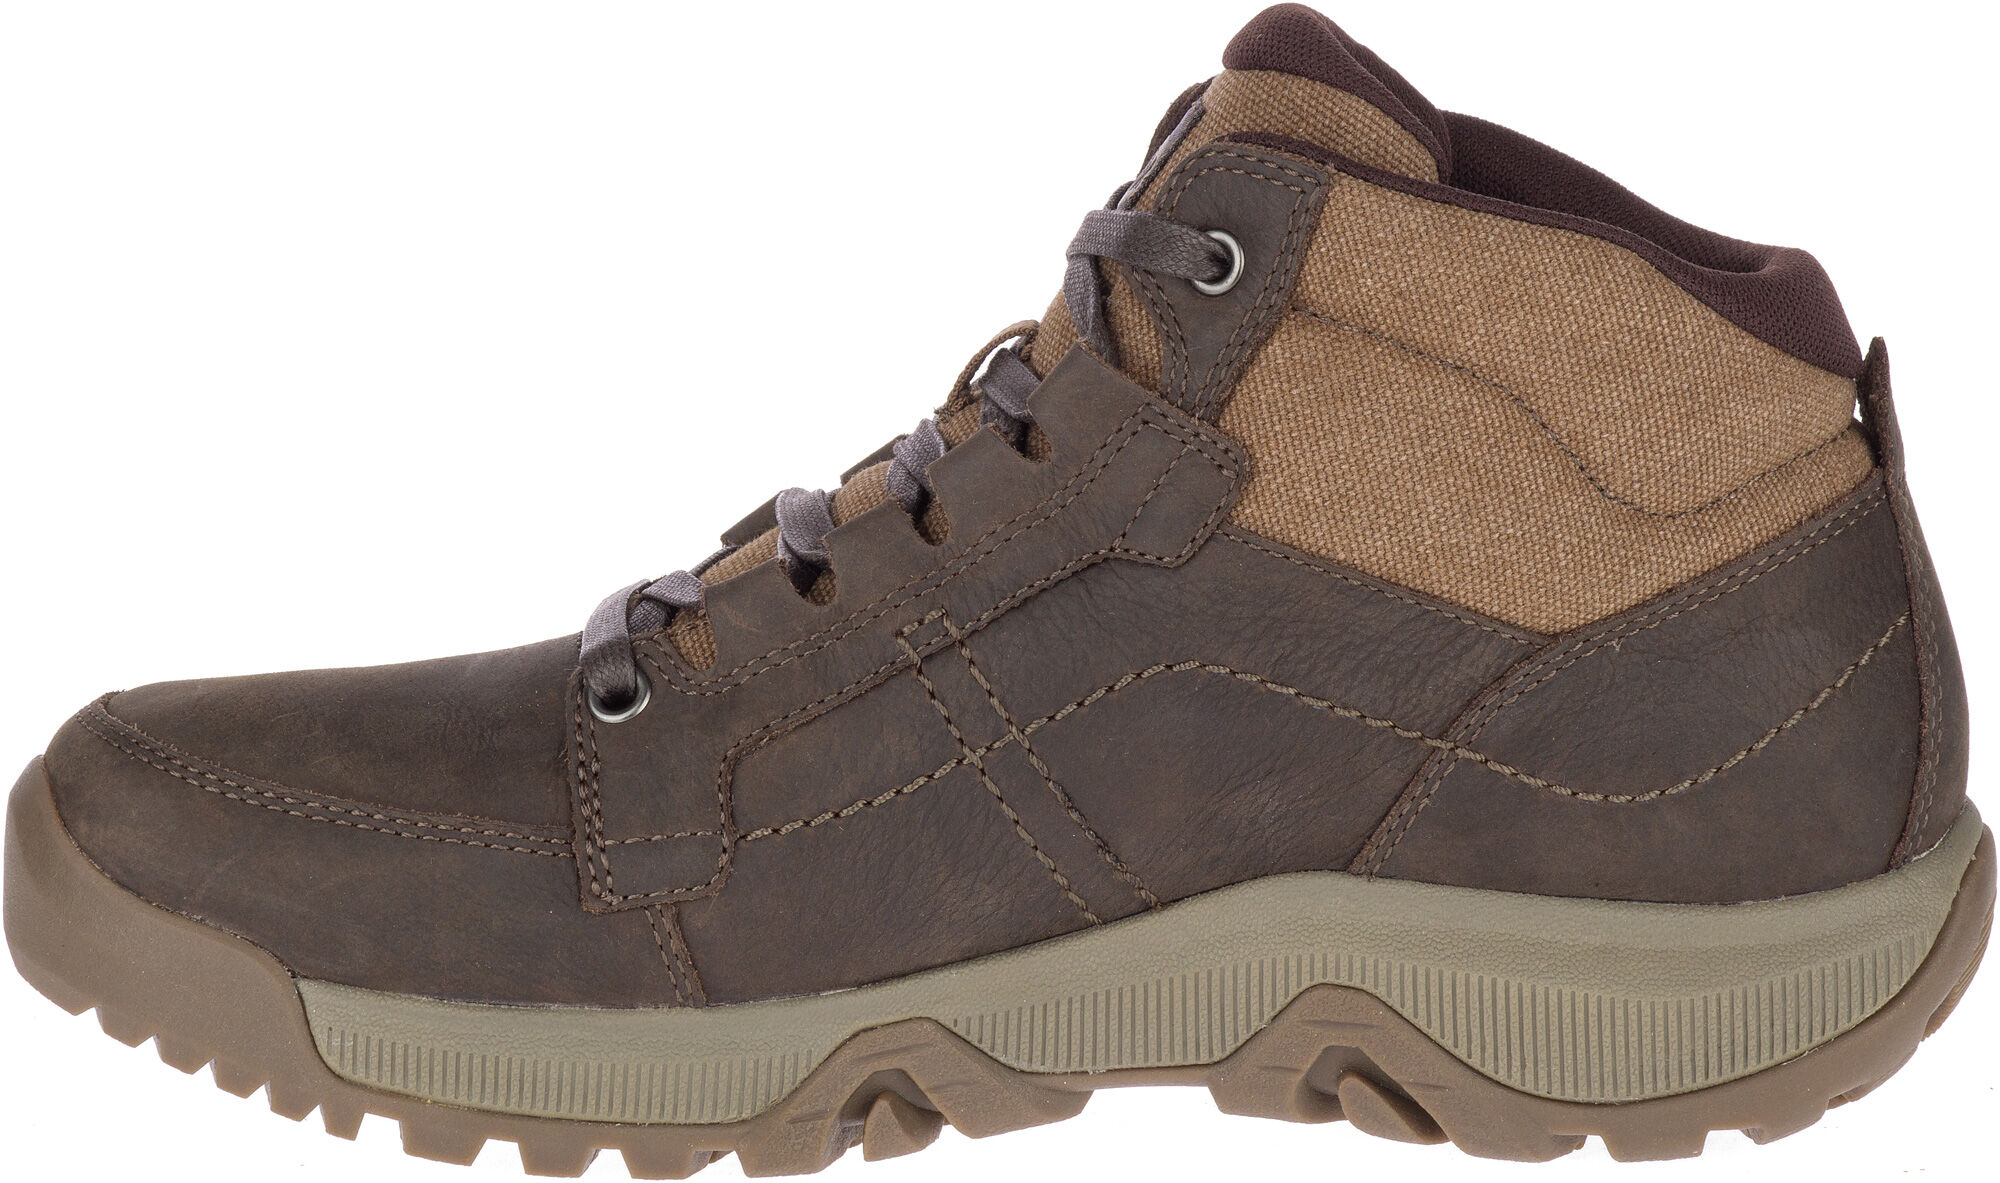 Merrell ANVIK PACE MID WP Férfi utcai cipő (48 db